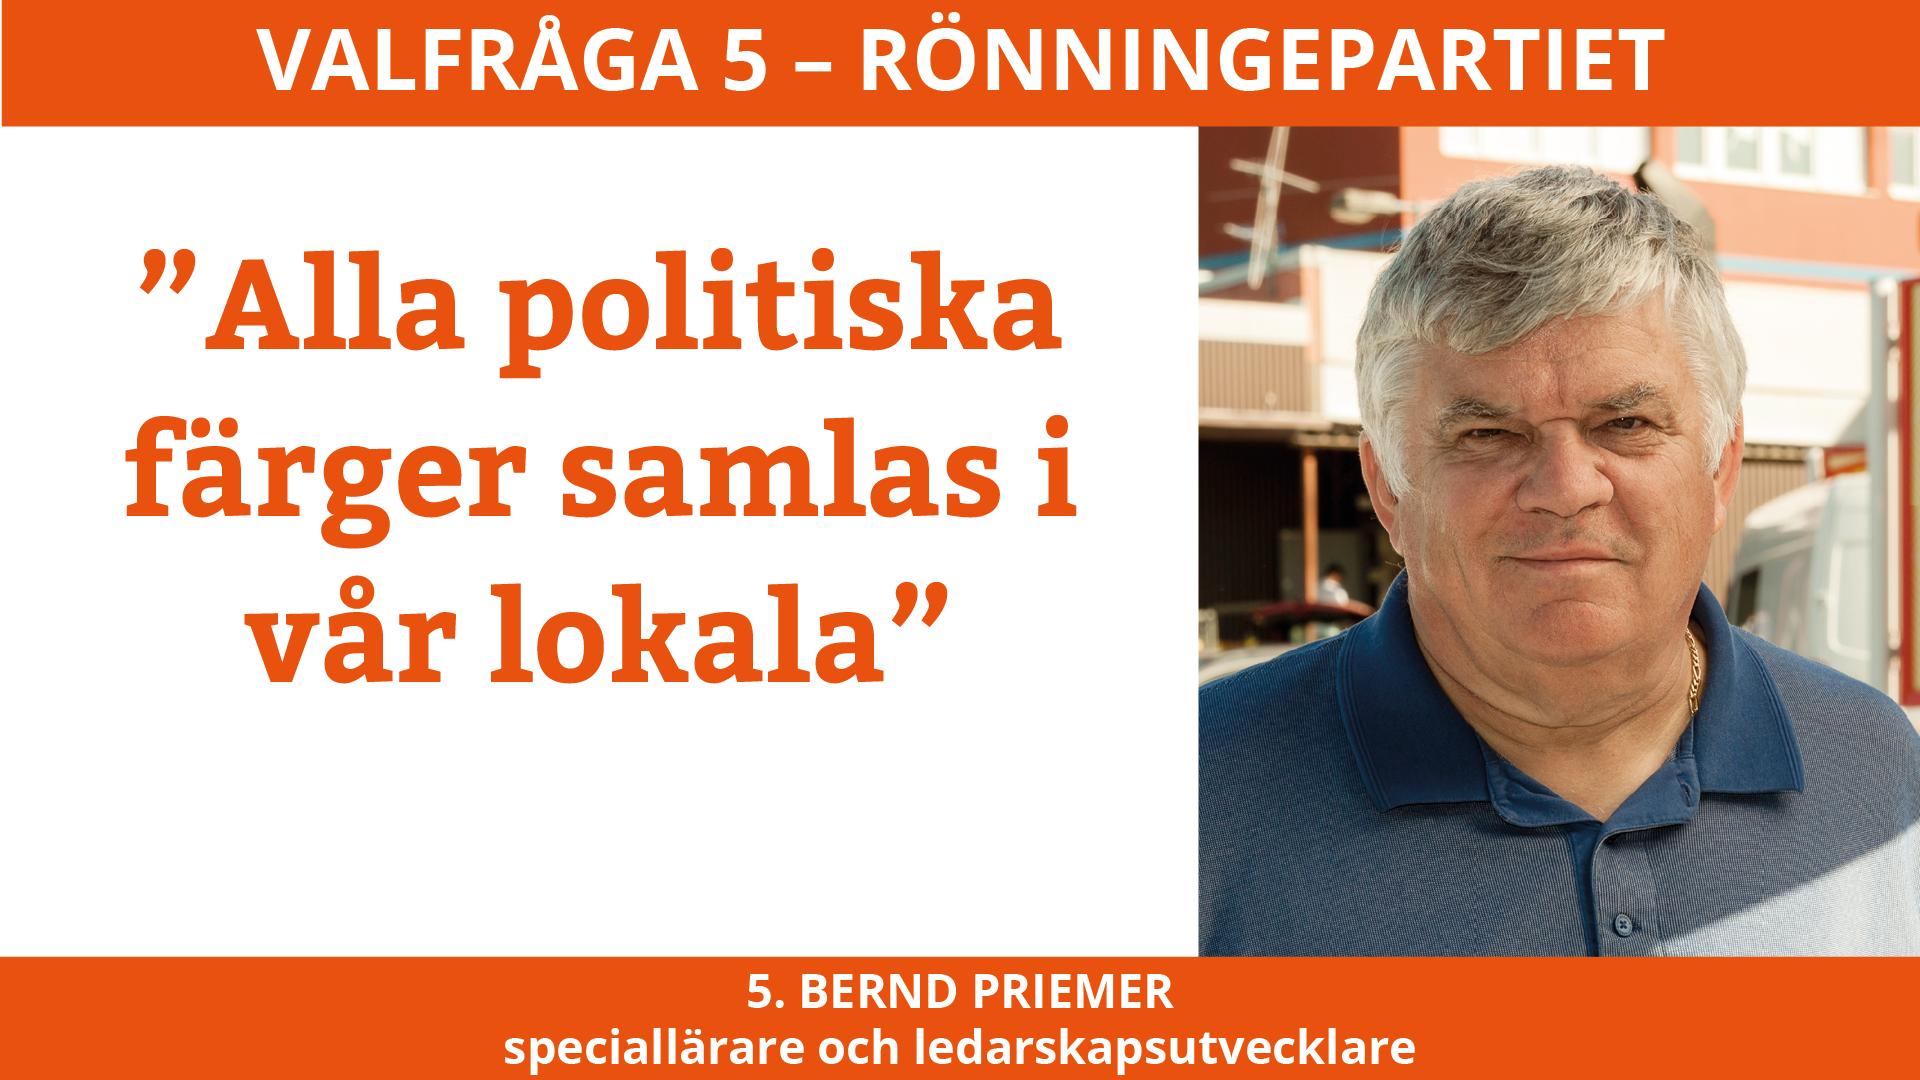 Valfråga 5 – Bernd Priemer Rönningepartiet